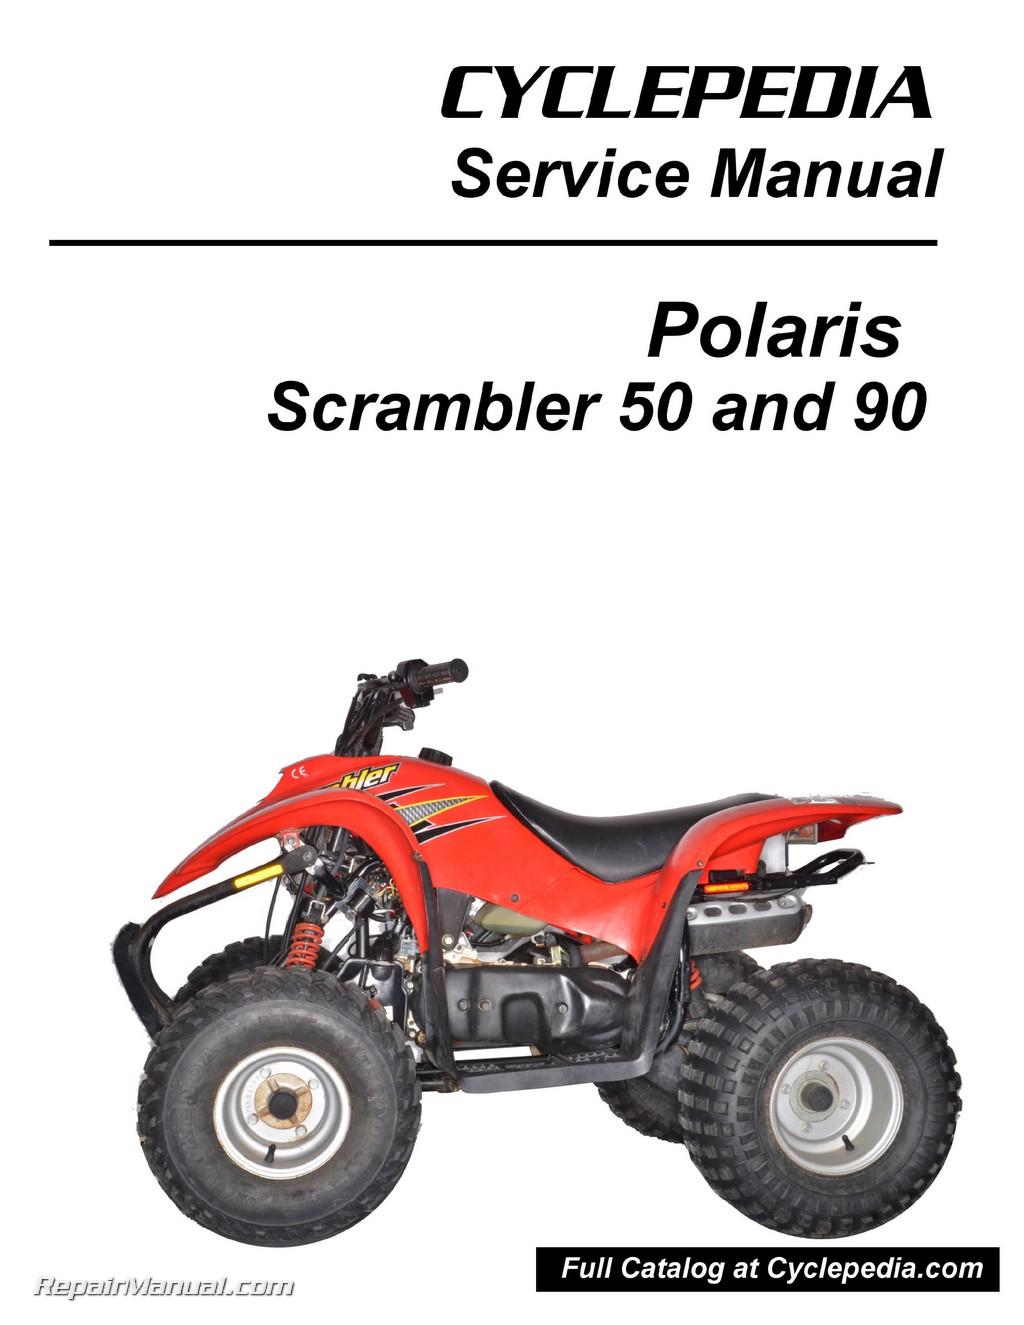 polaris xplorer 400 manual ebook rh polaris xplorer 400 manual ebook angelayu us 2013 Polaris Sportsman 850 2013 Polaris Sportsman 500 Touring